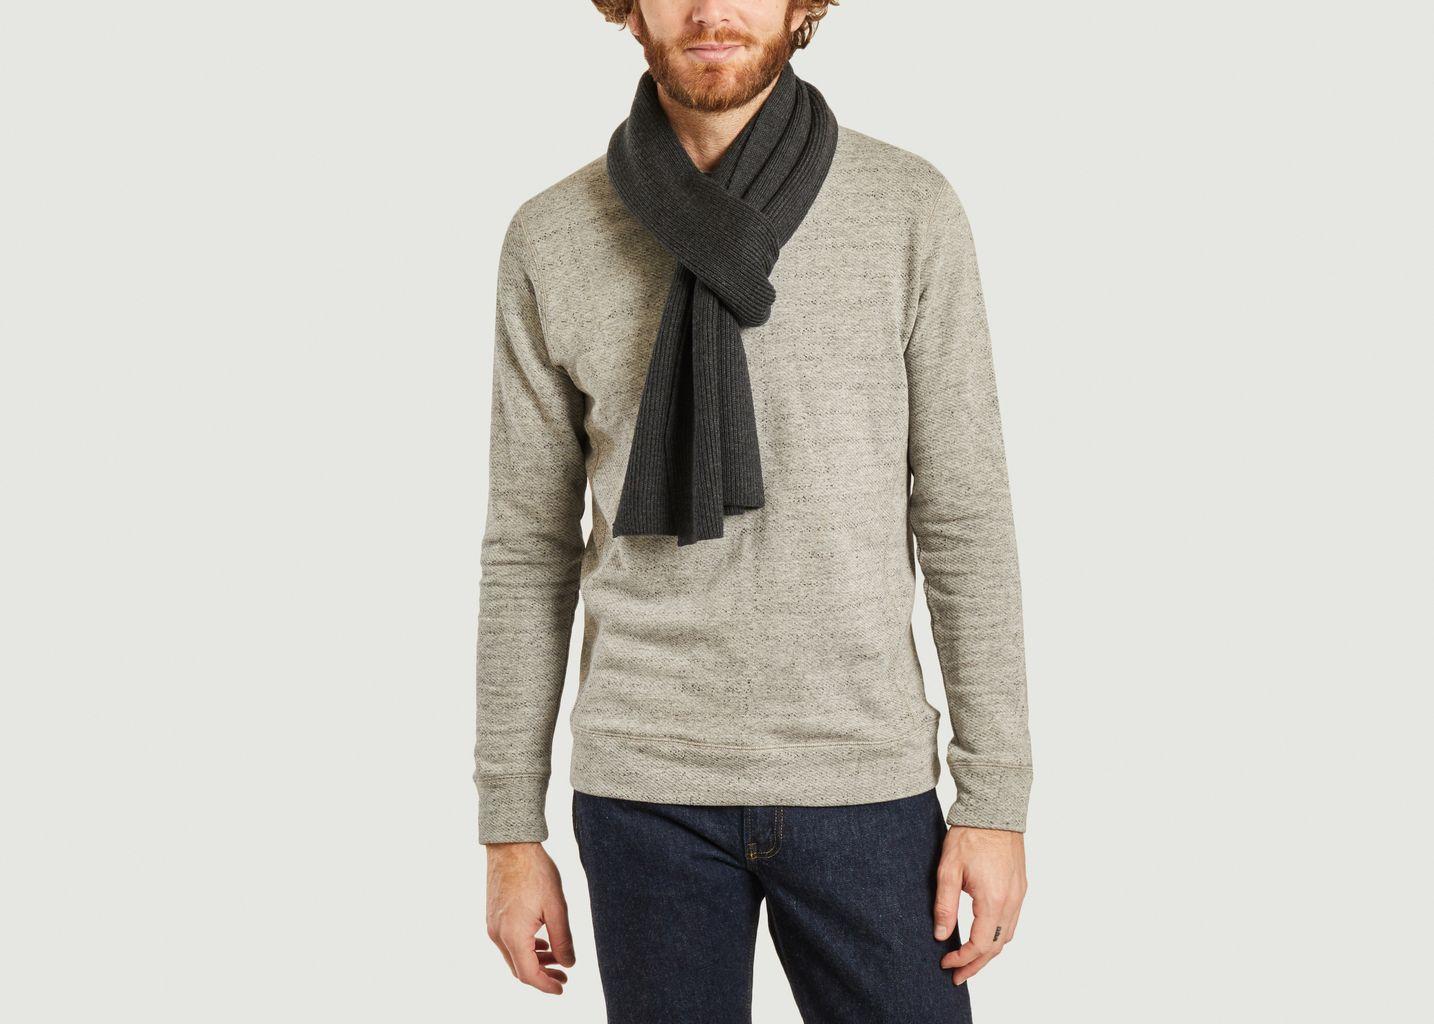 Echarpe siglée en laine  - Polo Ralph Lauren